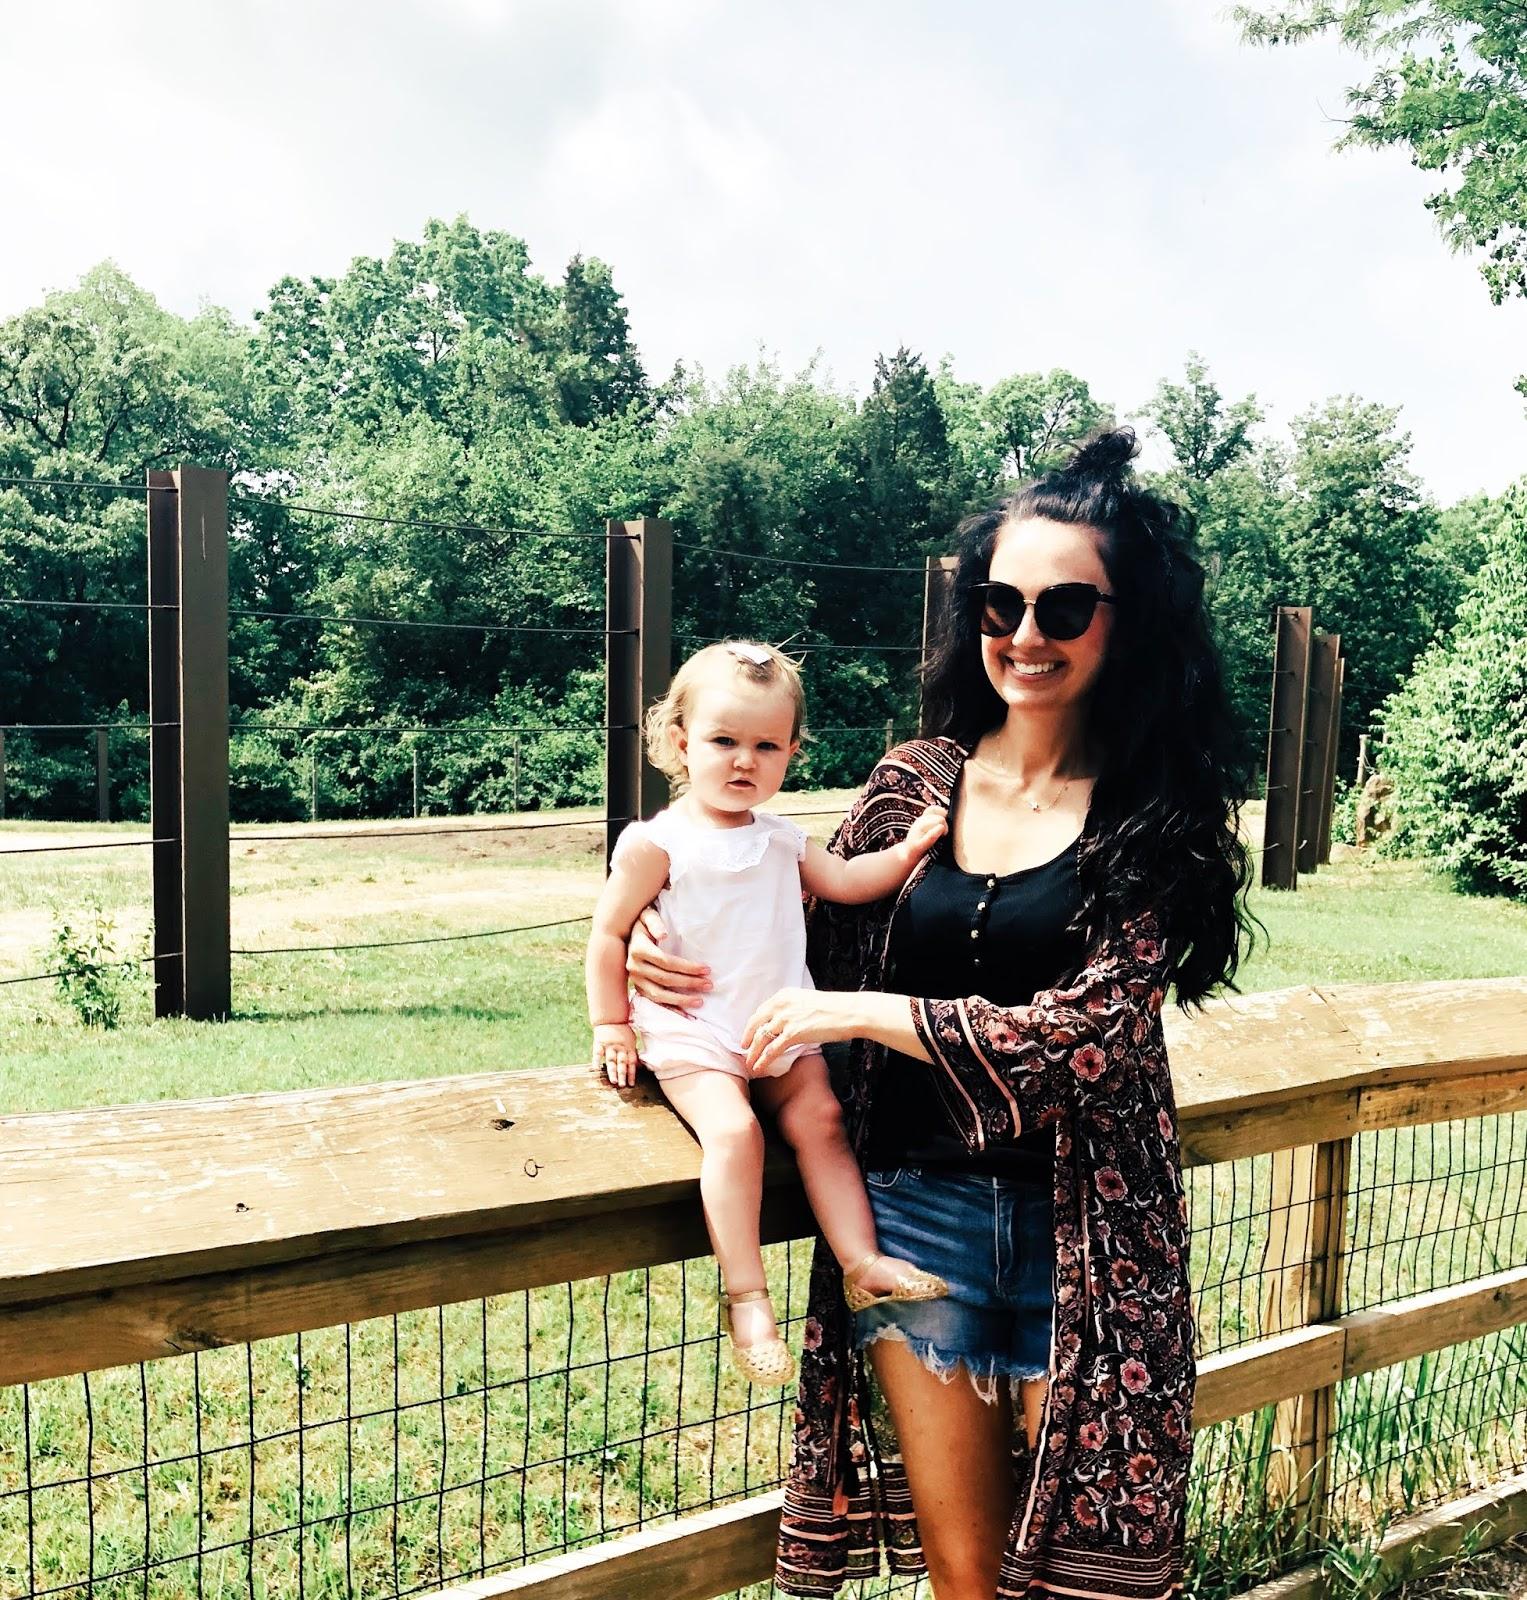 Field Trip to the Kansas City Zoo